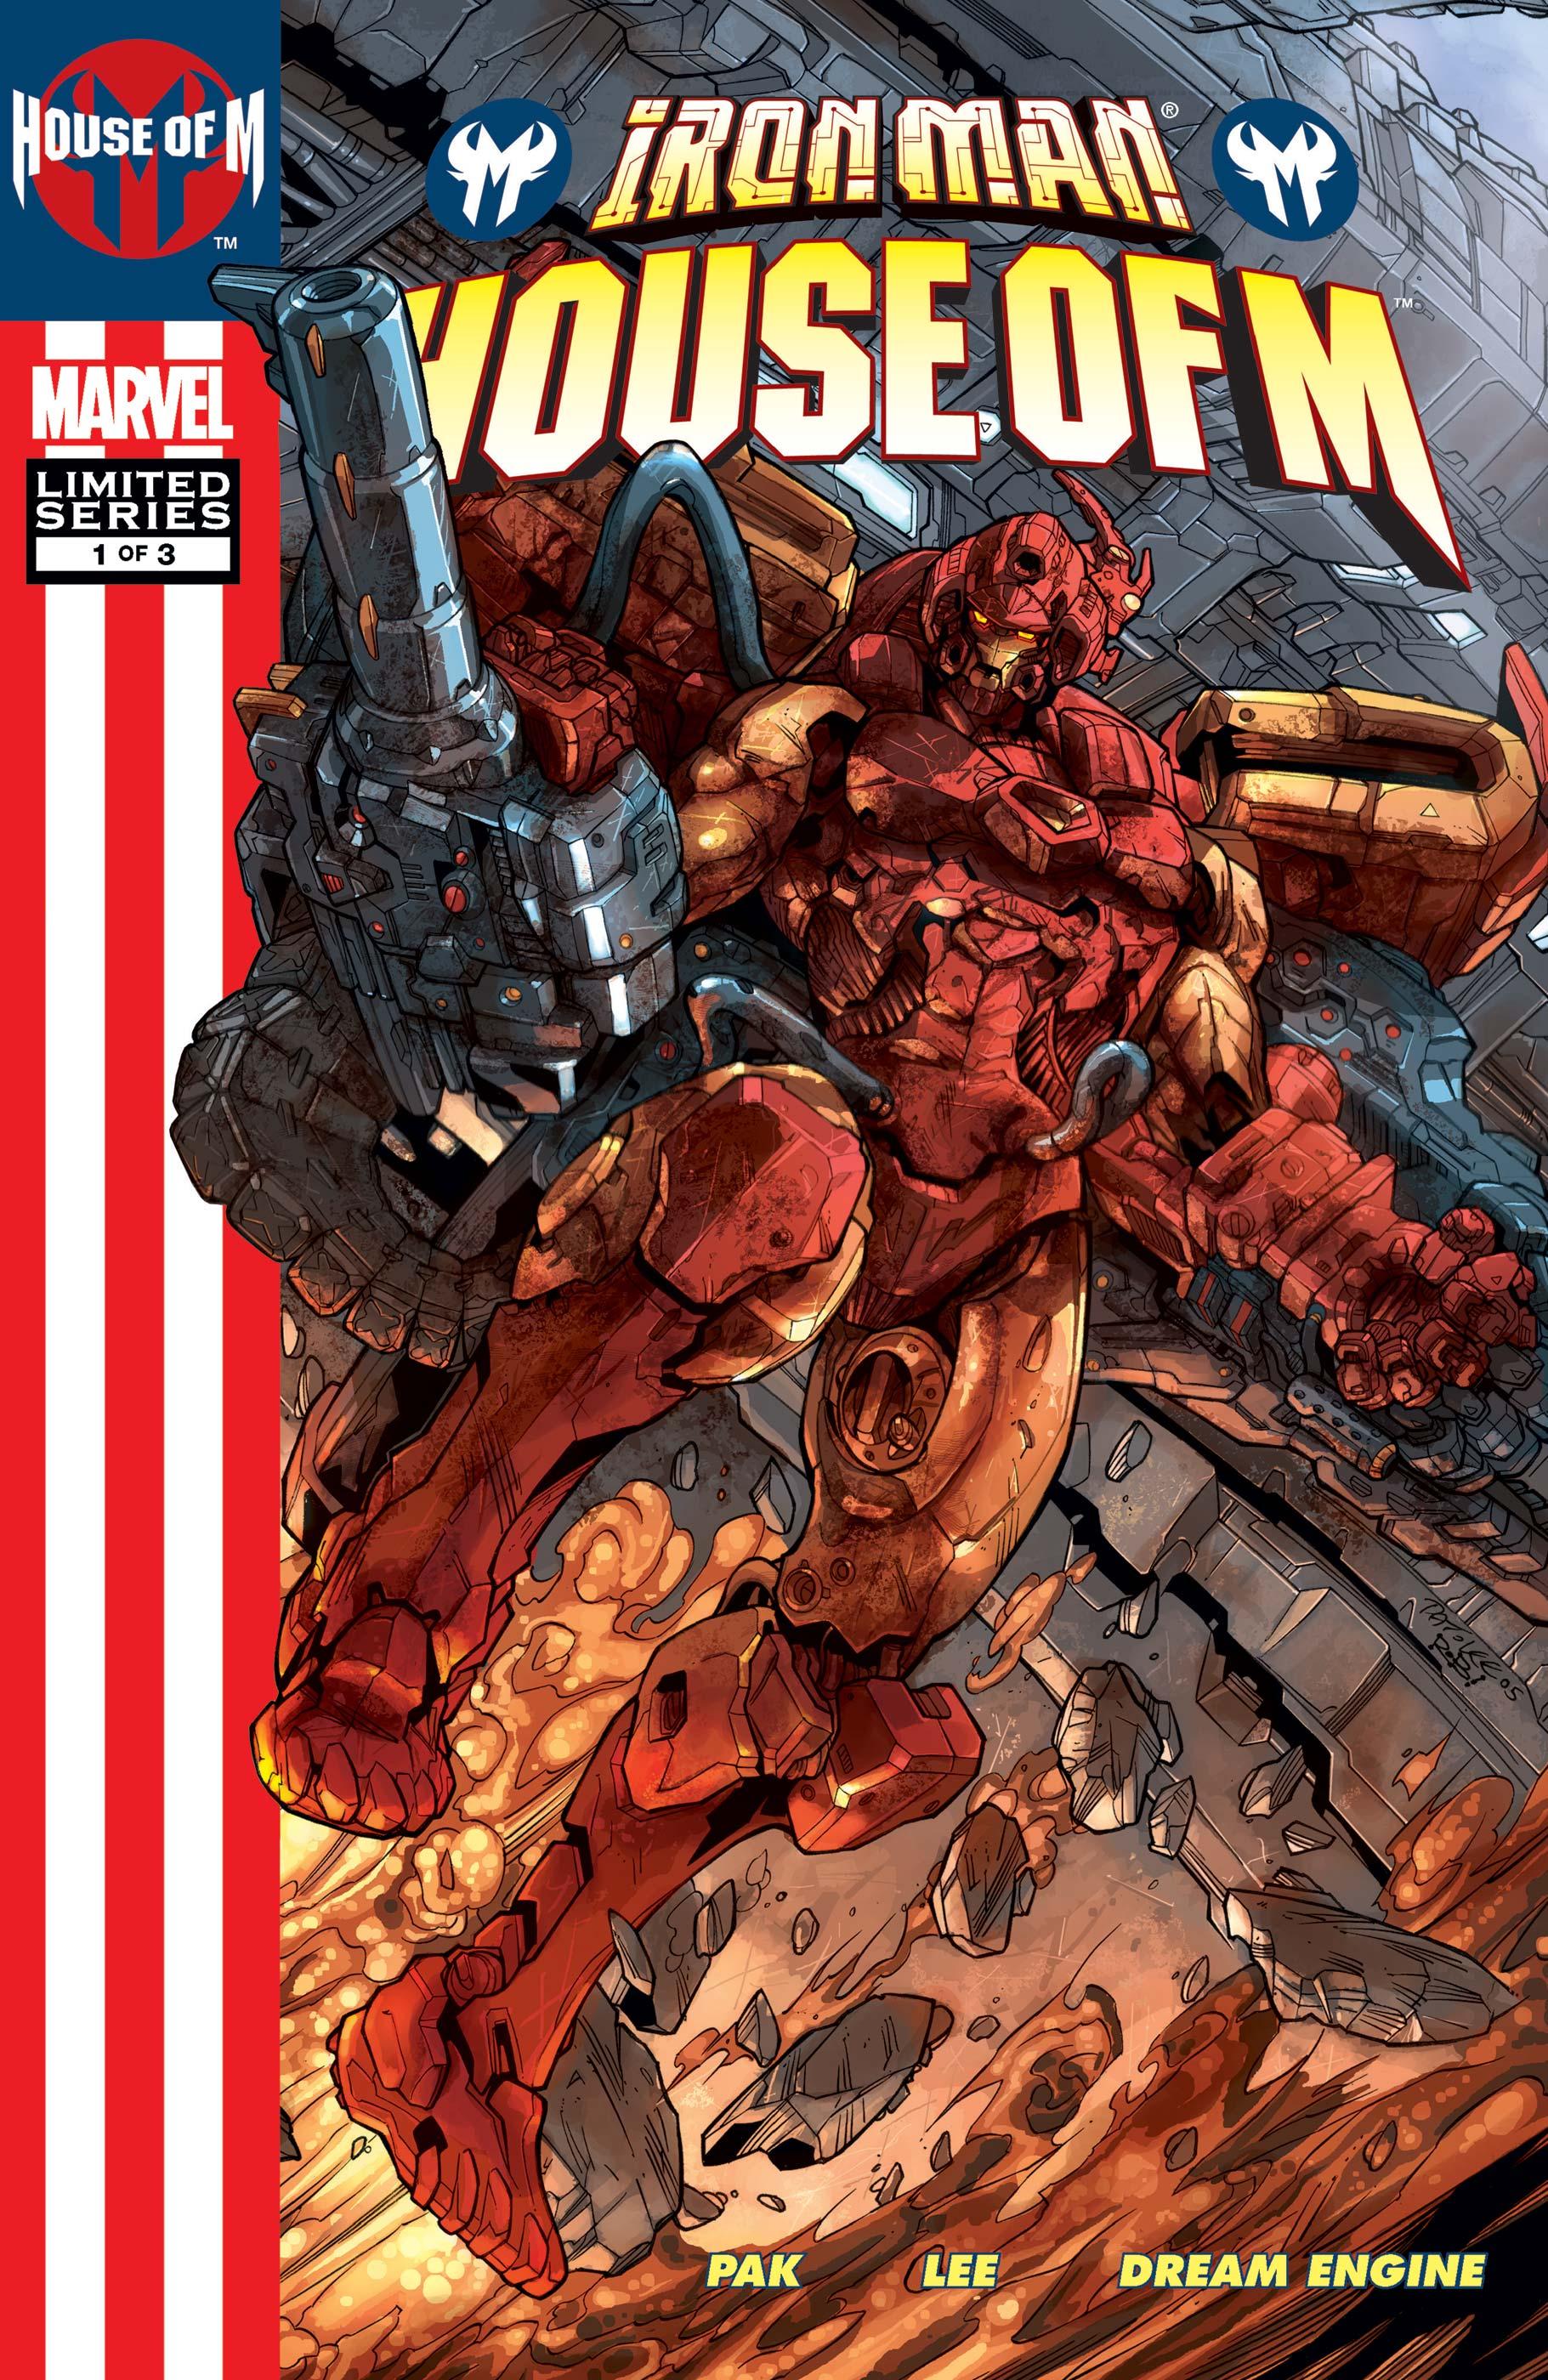 Iron Man: House of M (2005) #1